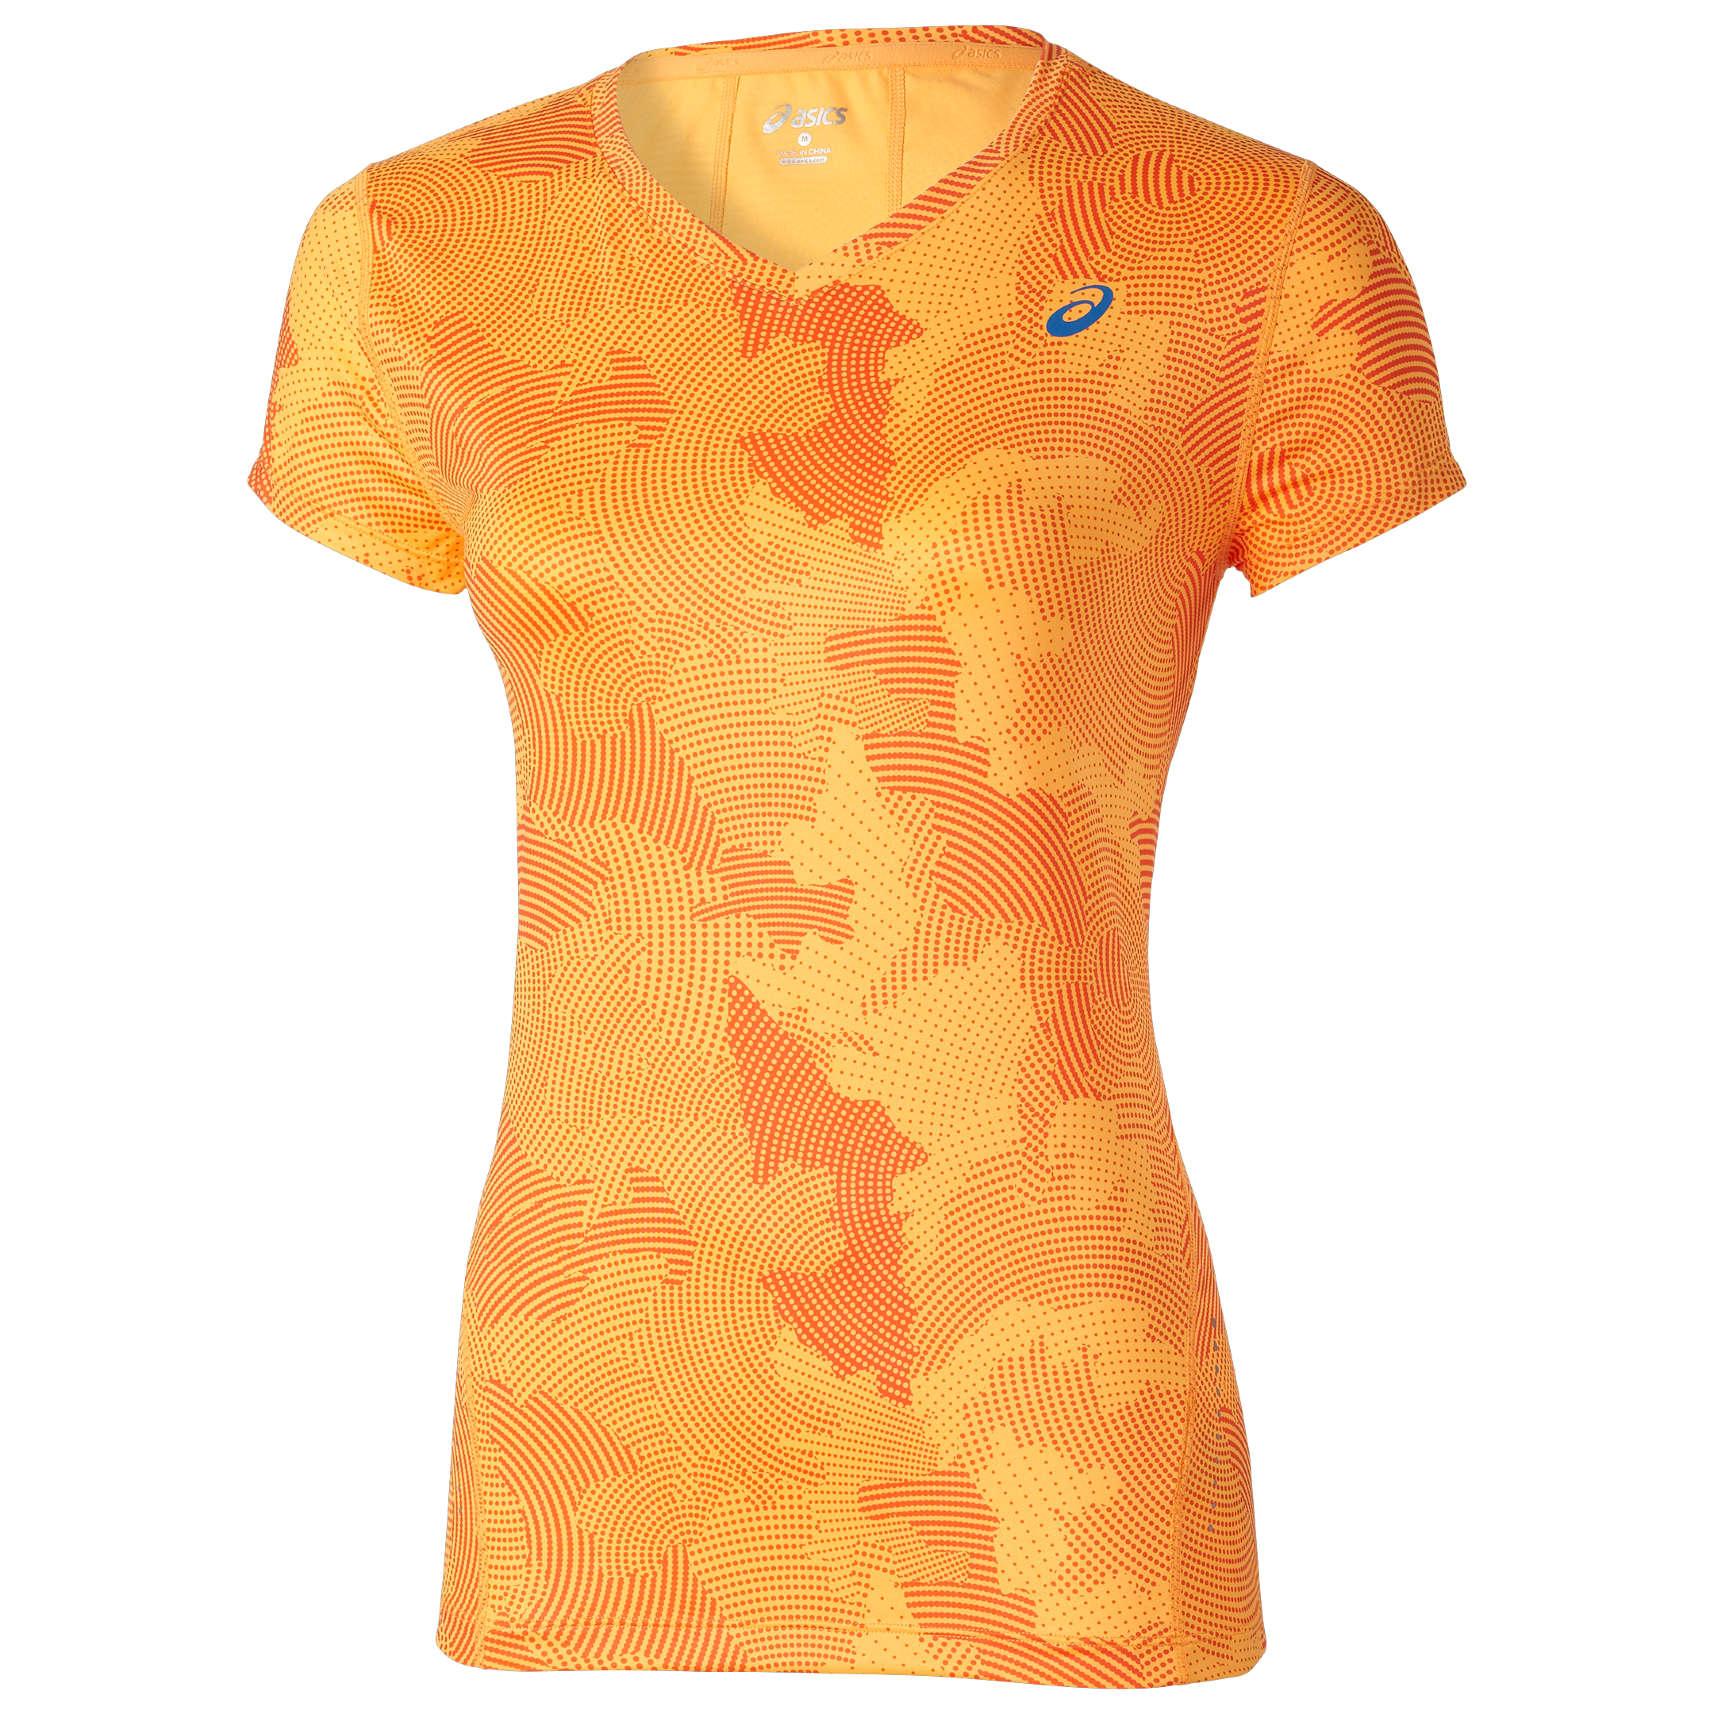 74b810fee17 ASICS Allover Graphic Shirt Korte Mouwen Oranje Dames koop je bij ...